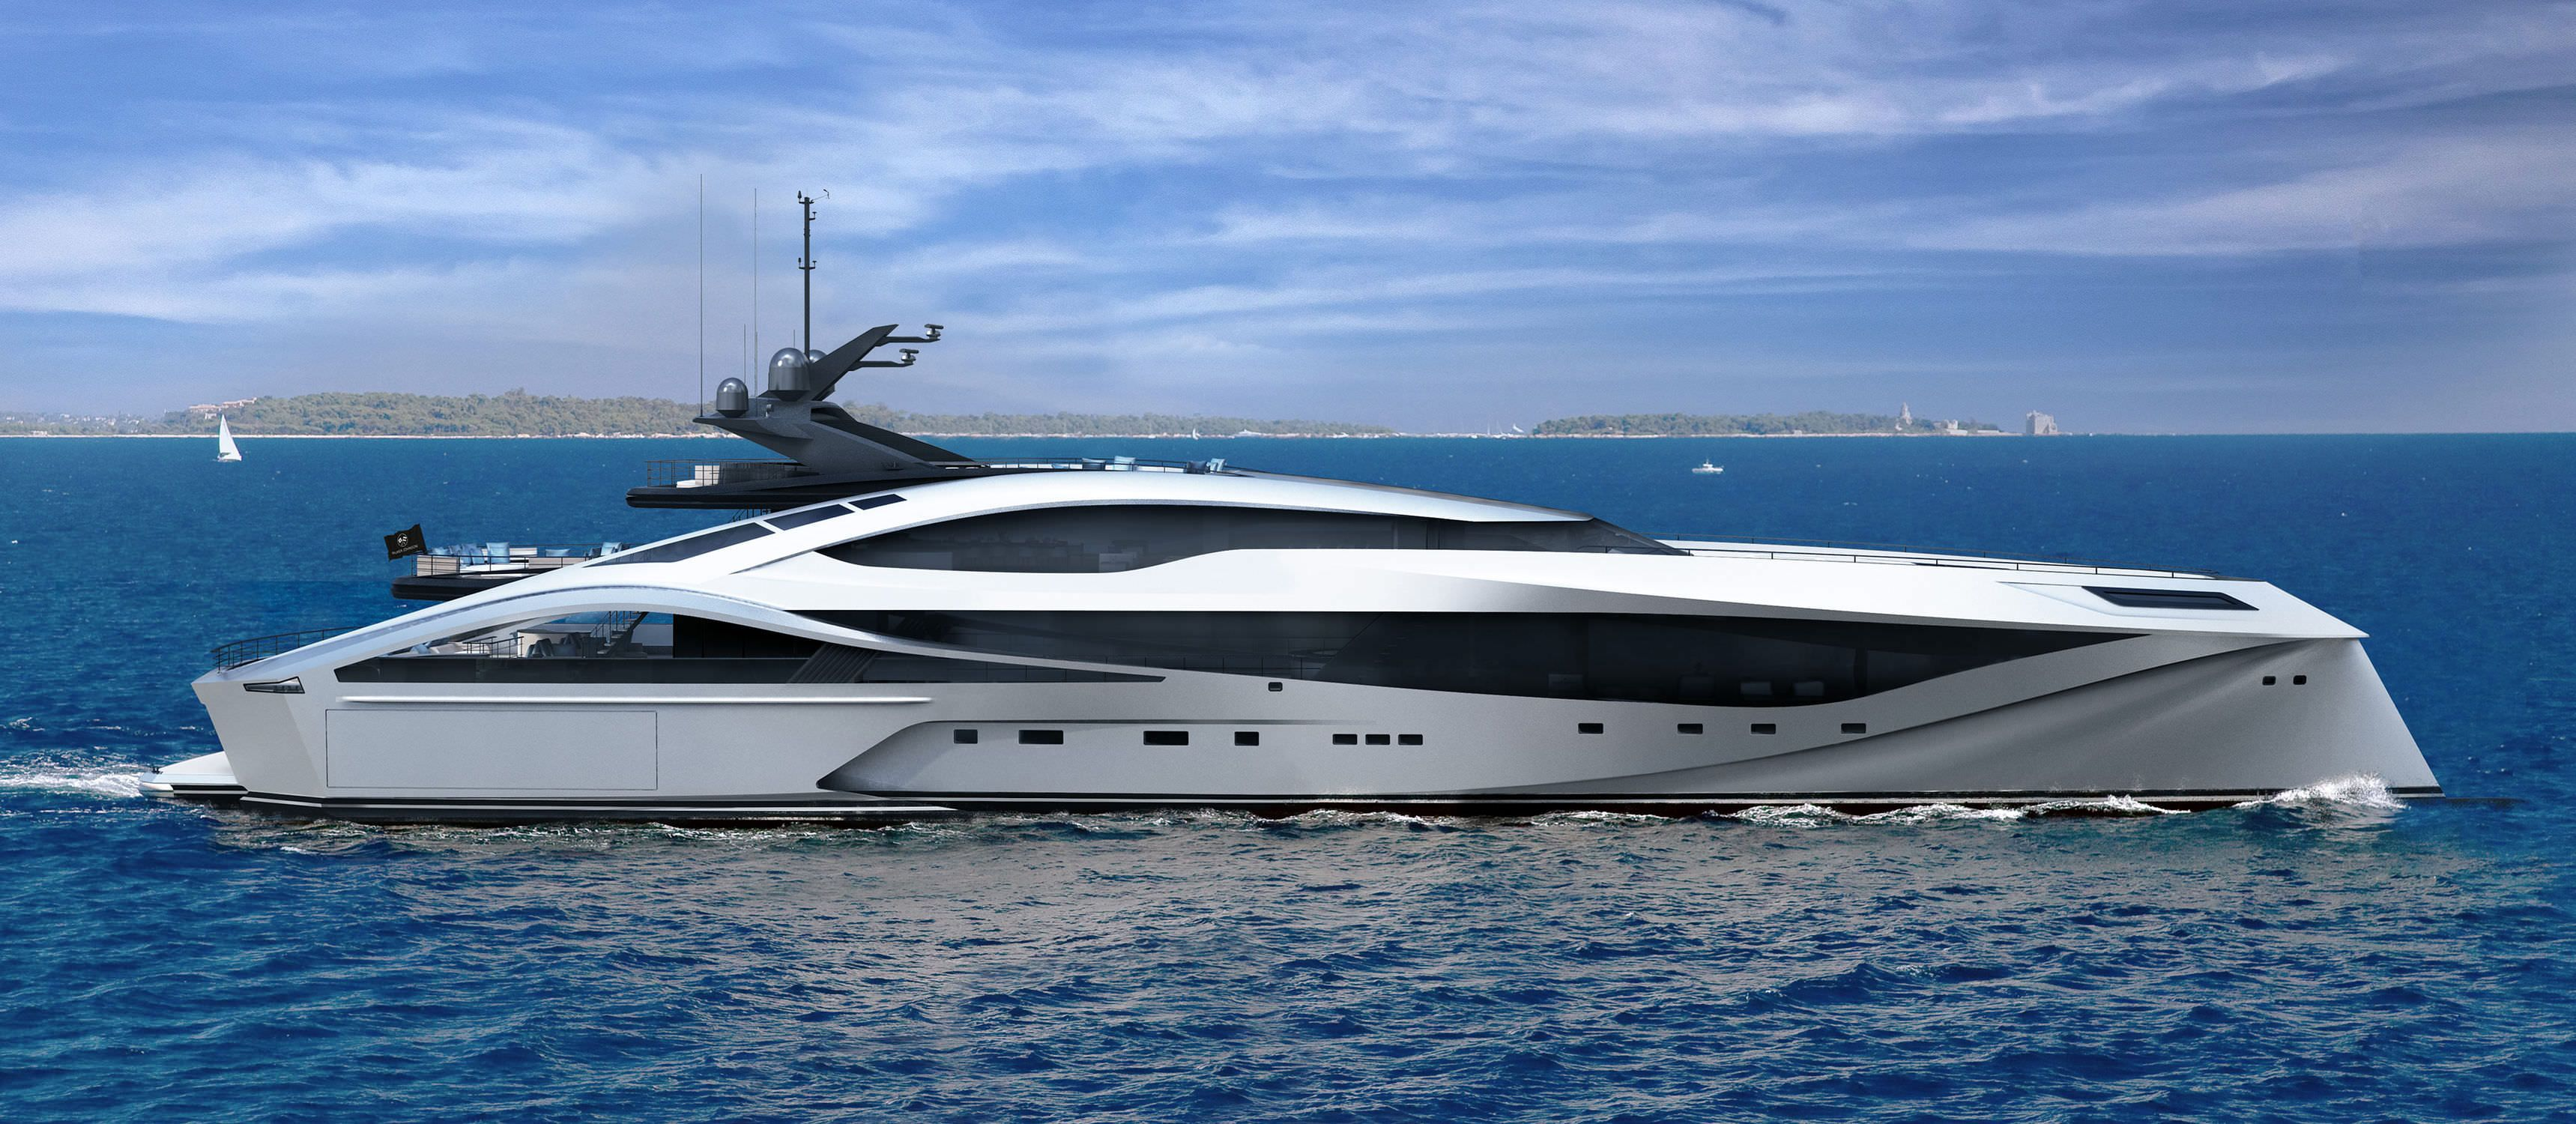 Sport Yacht 72m Palmer Johnson Google Search Yachts Pinterest Sport Yacht Cars And Wheels